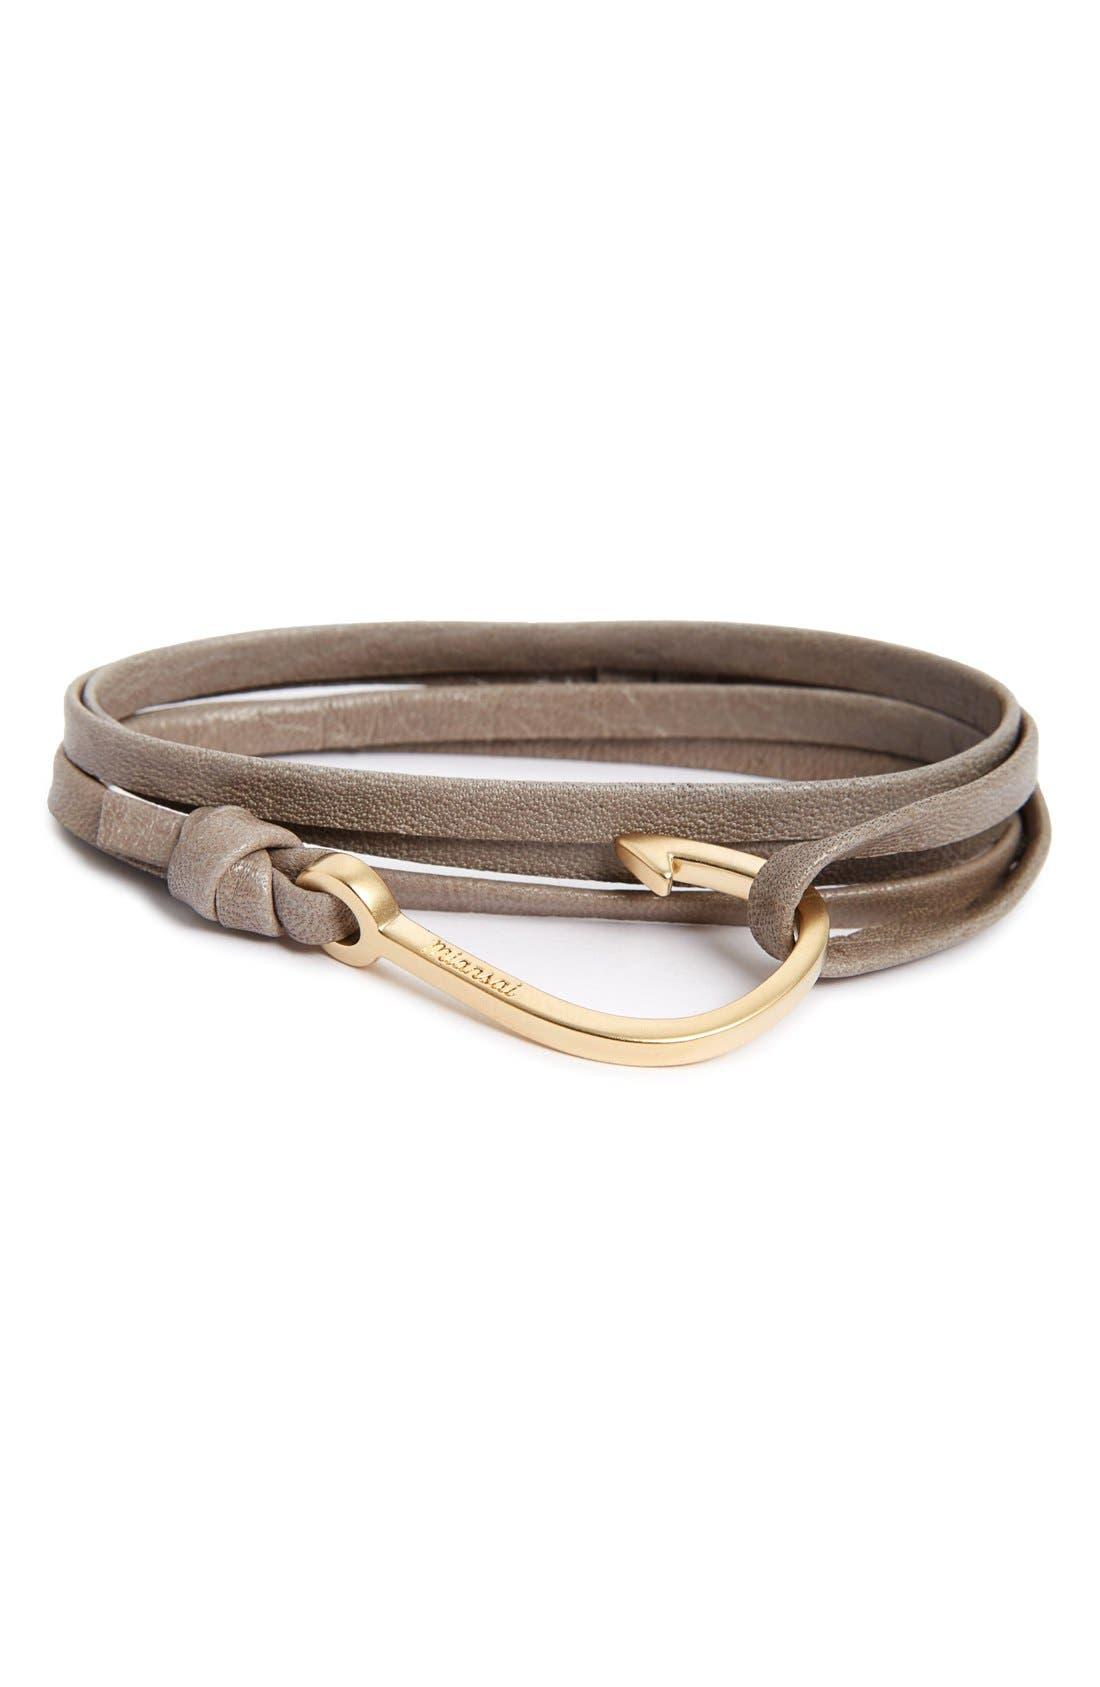 Hook On Leather Wrap Bracelet,                             Main thumbnail 1, color,